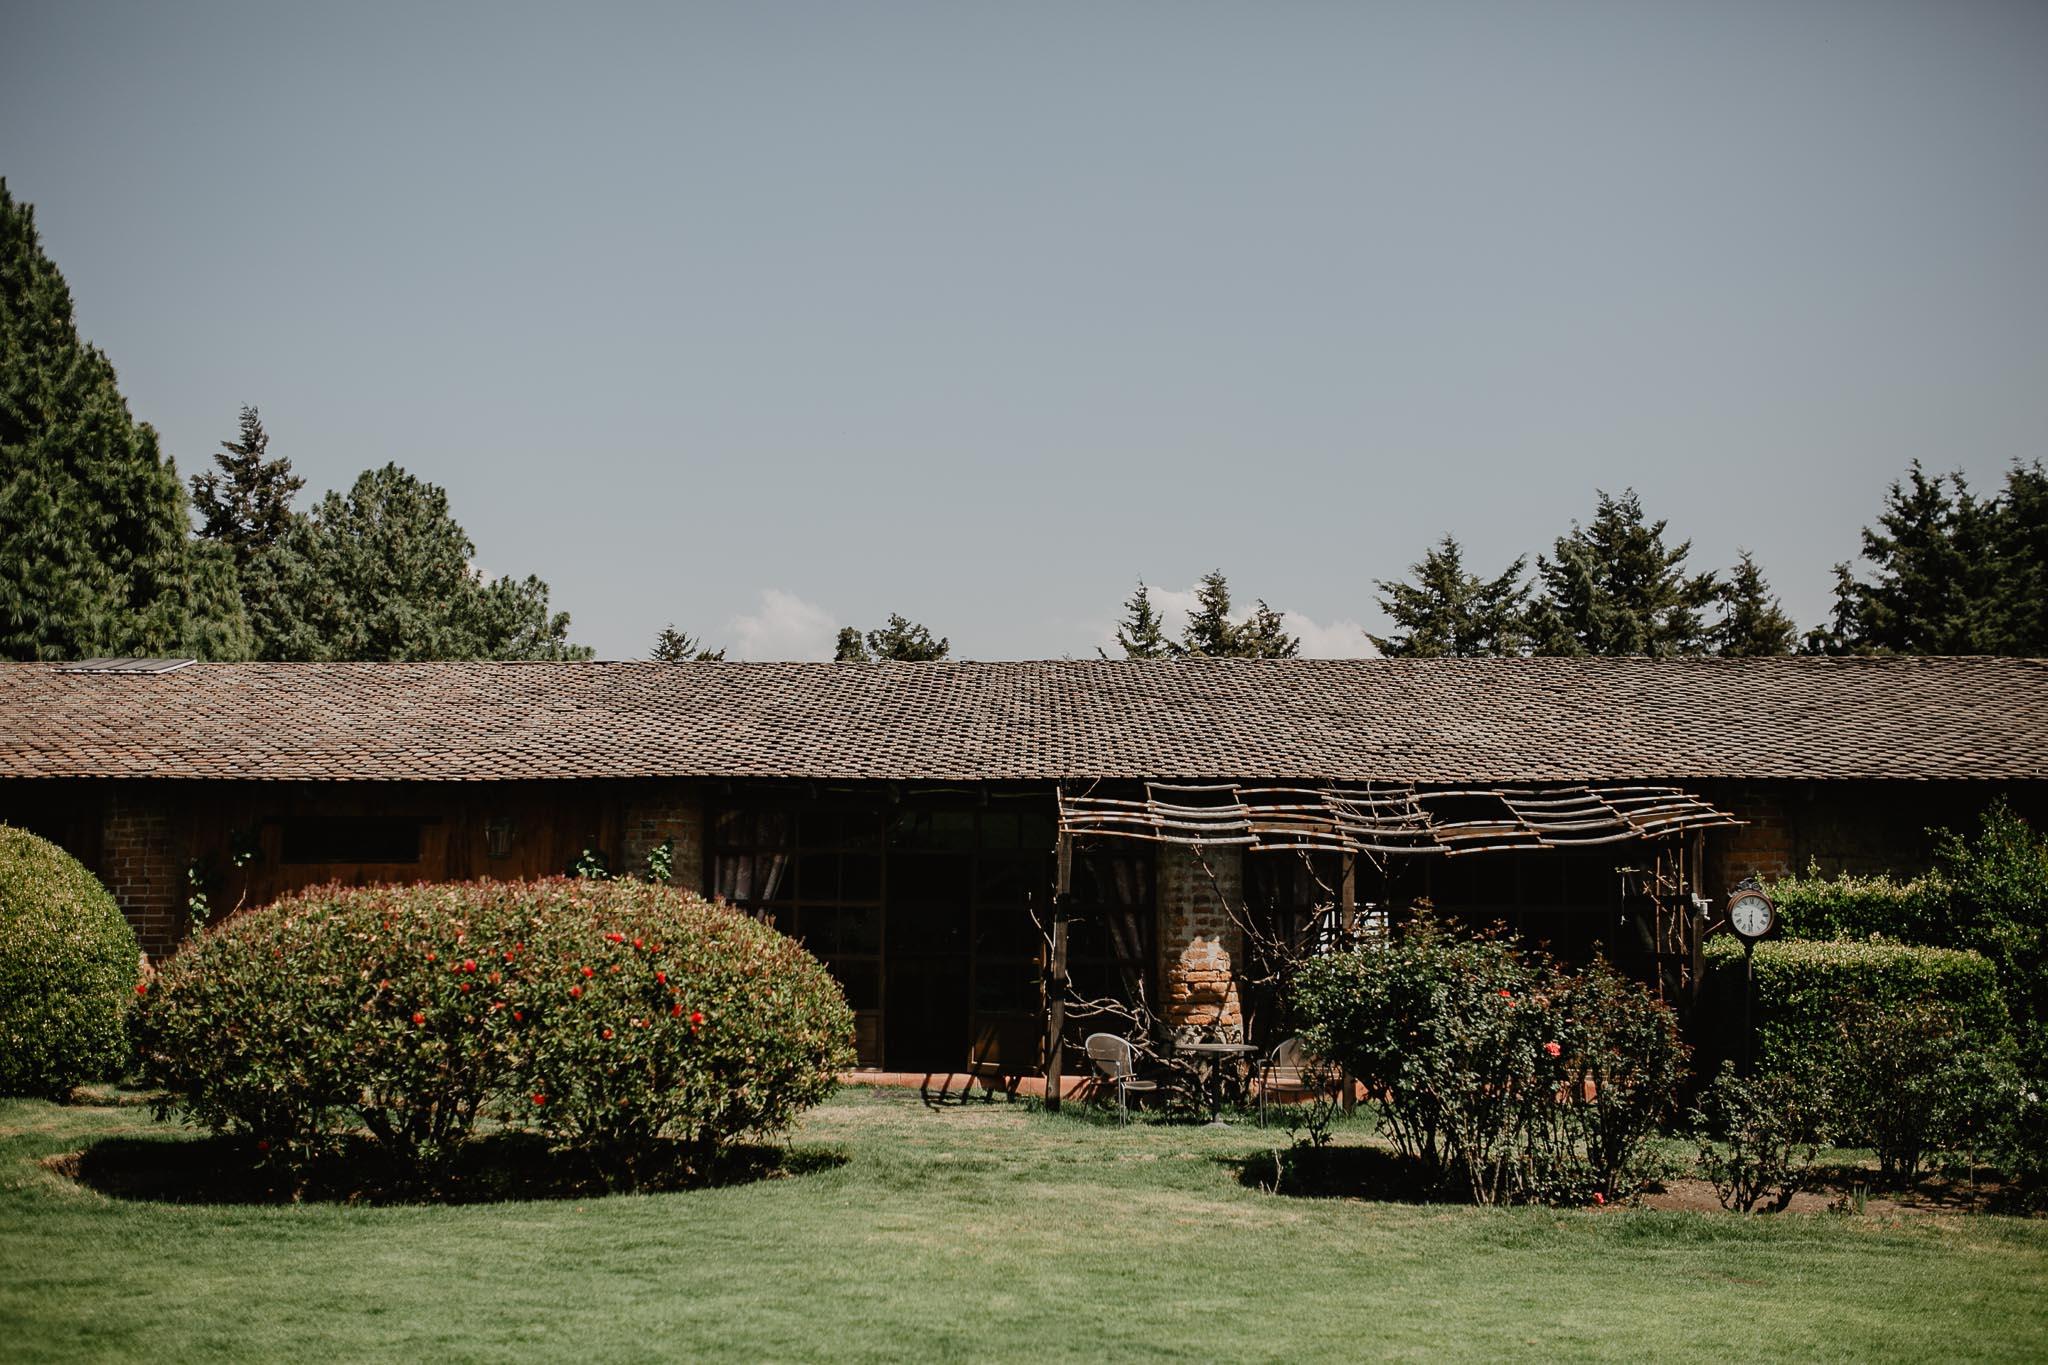 hacienda-san-andres-IMG_7131.jpg